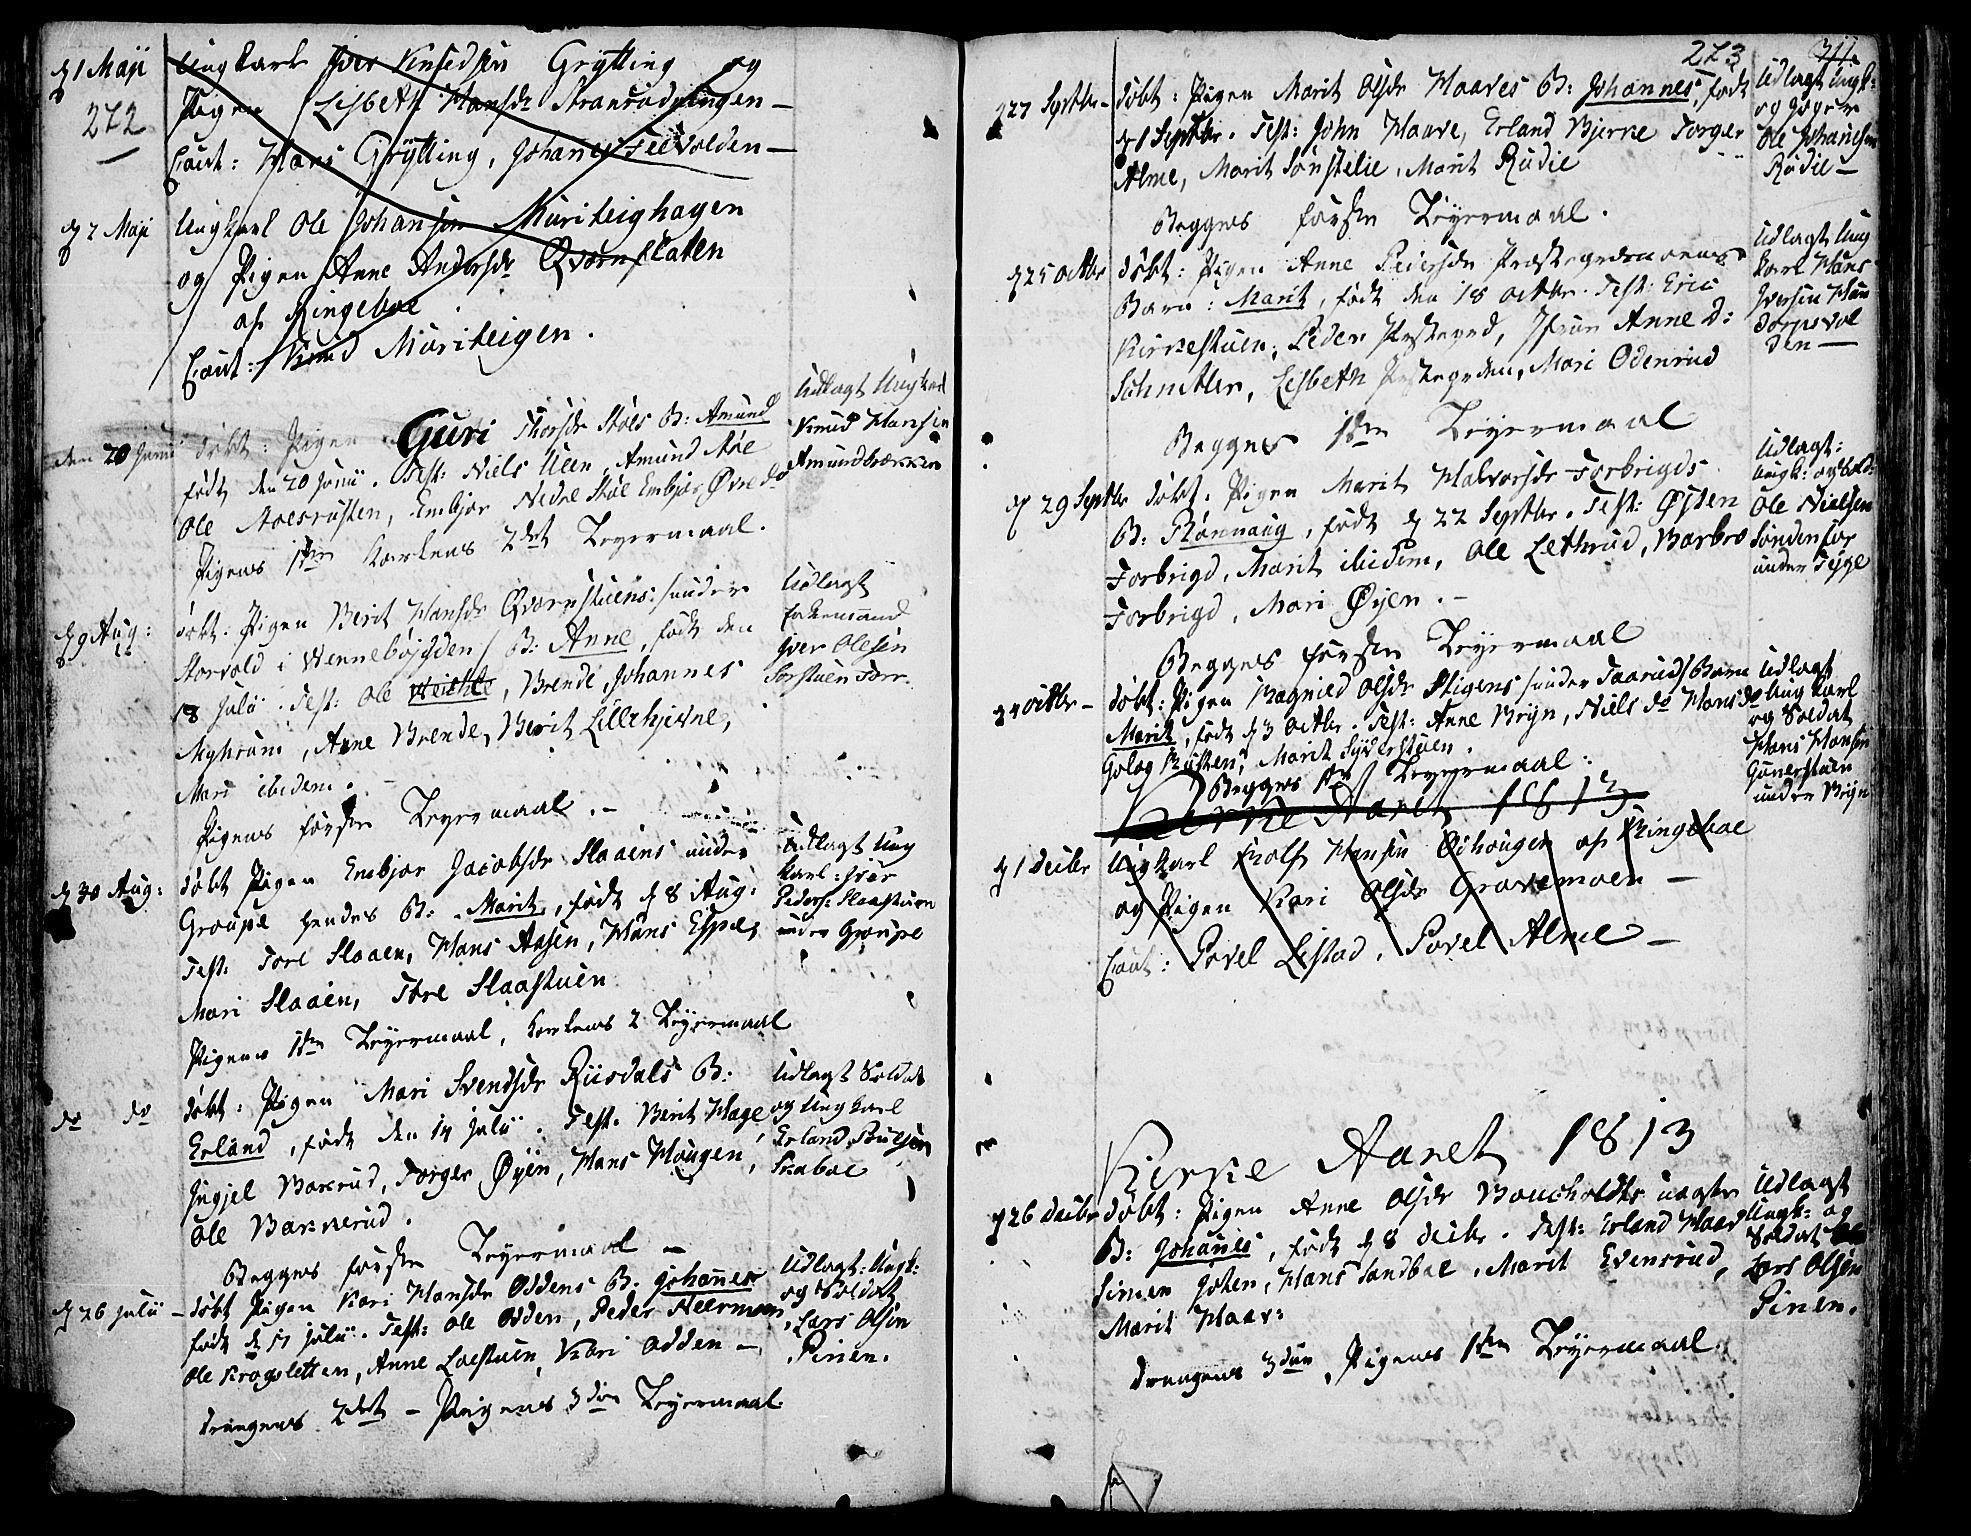 SAH, Fron prestekontor, H/Ha/Haa/L0001: Ministerialbok nr. 1, 1799-1816, s. 272-273